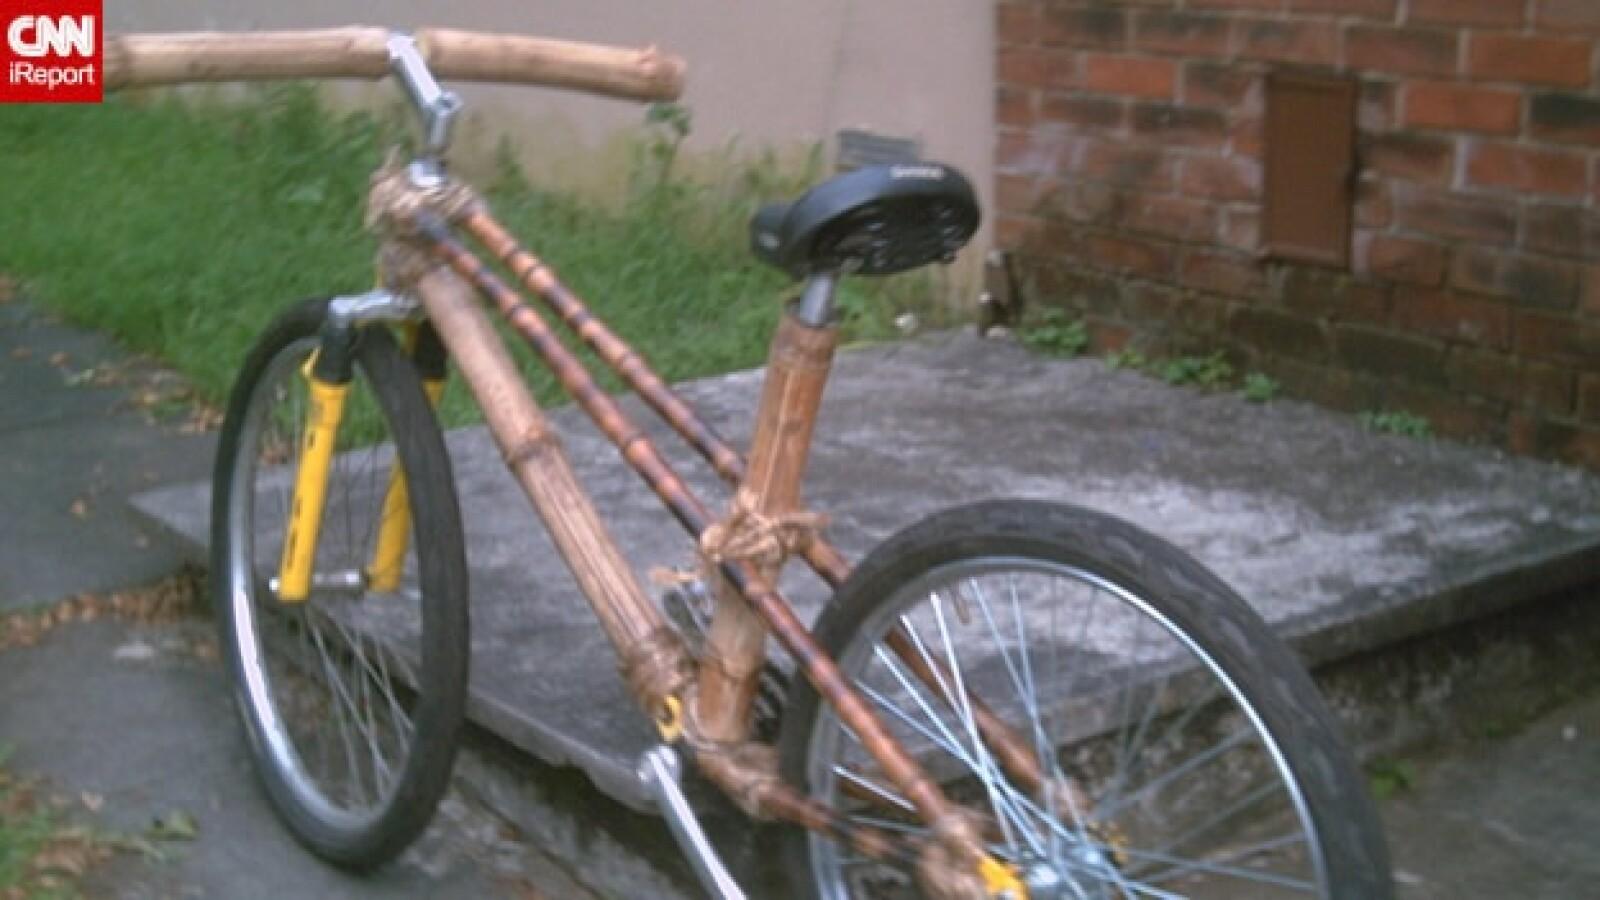 irpt-bicicleta-bambu2